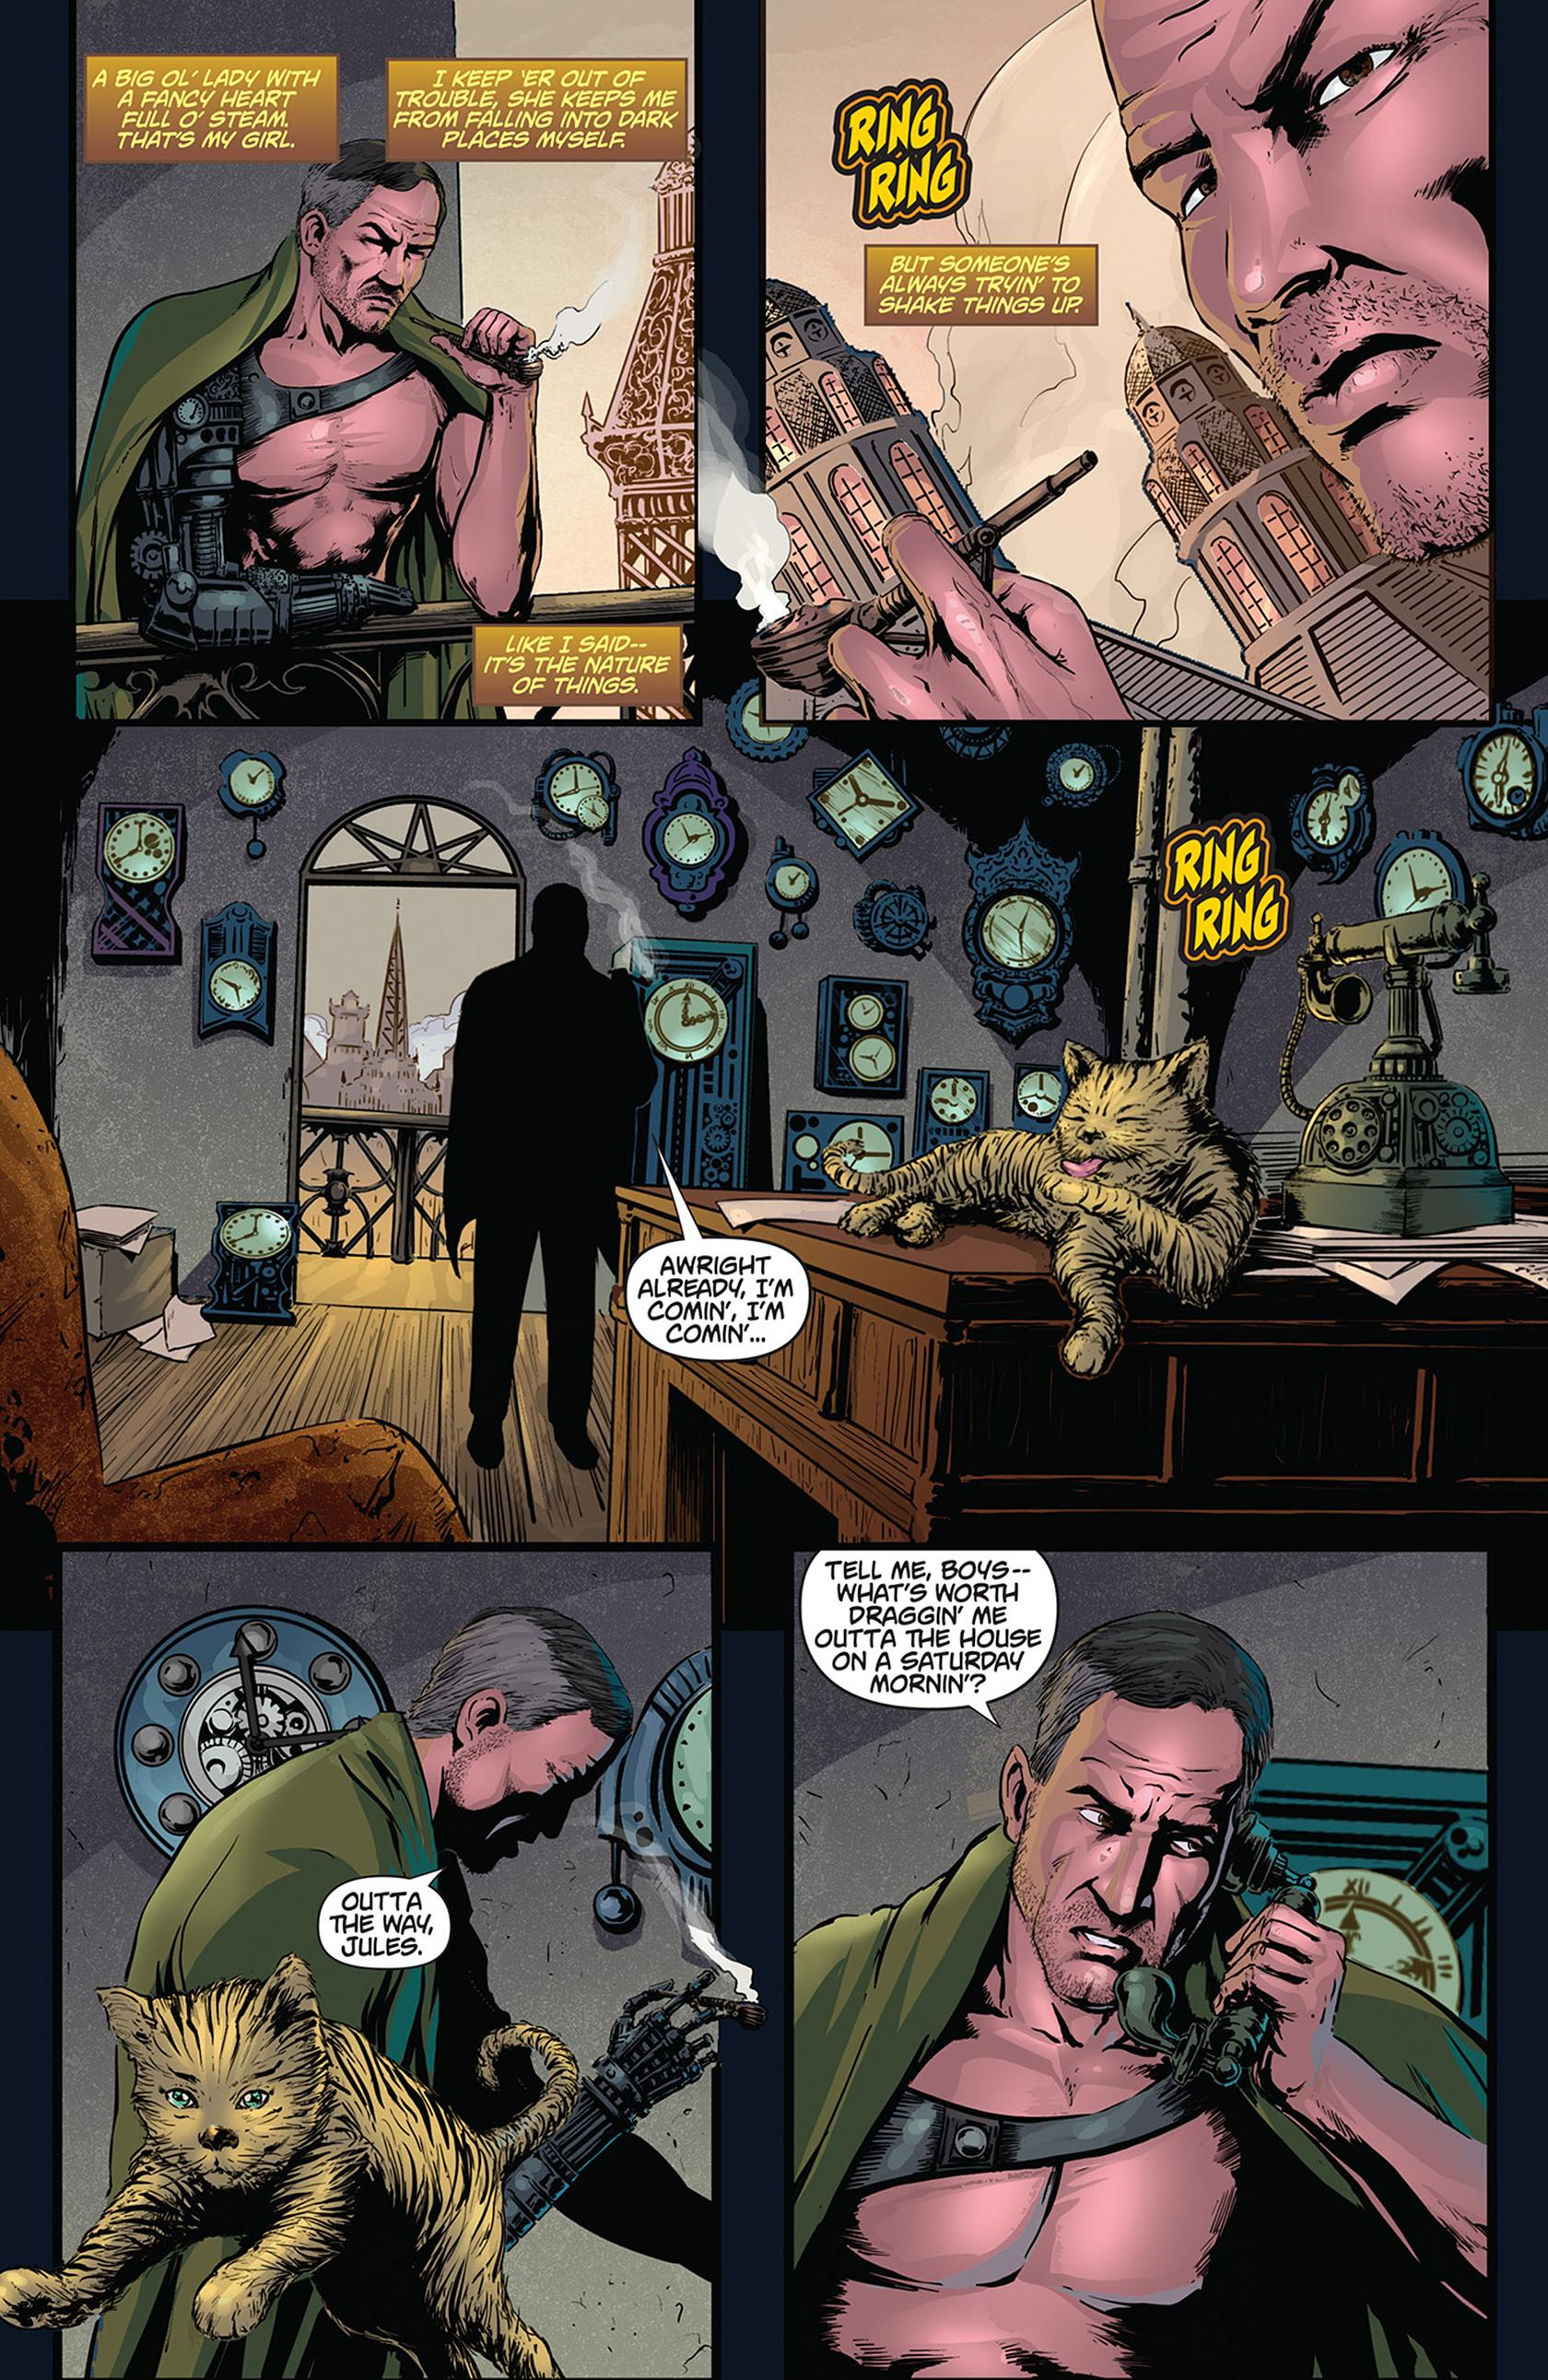 The Precinct graphic novel review